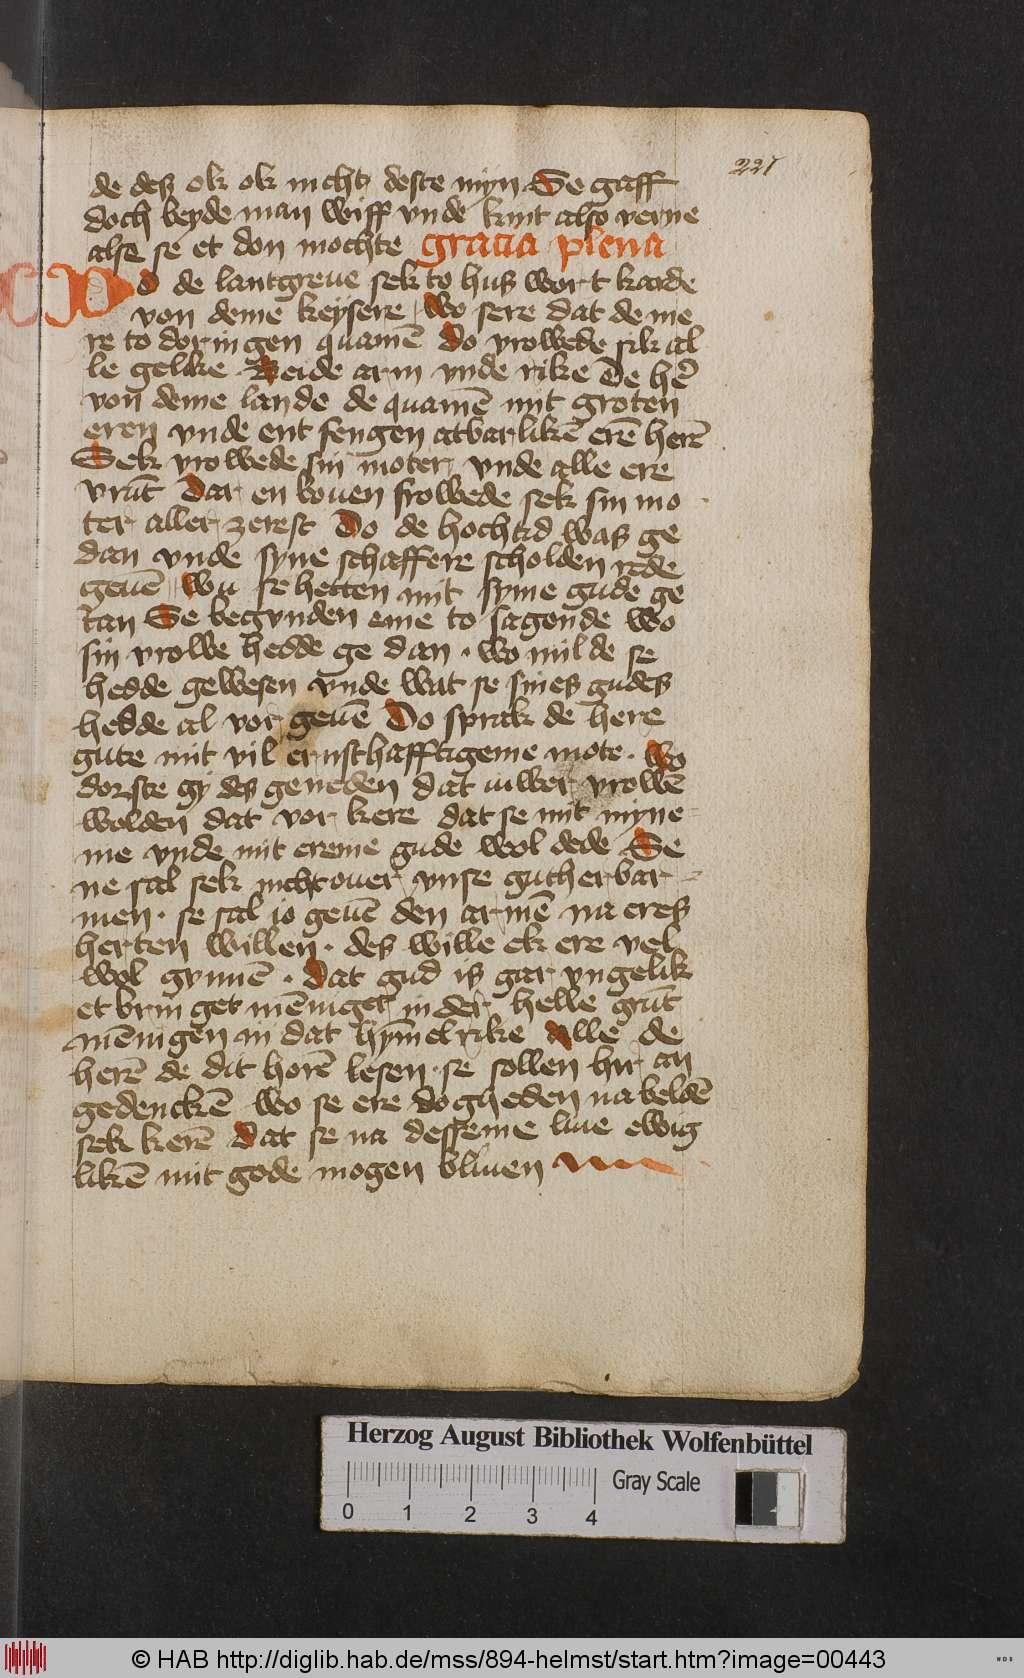 http://diglib.hab.de/mss/894-helmst/00443.jpg